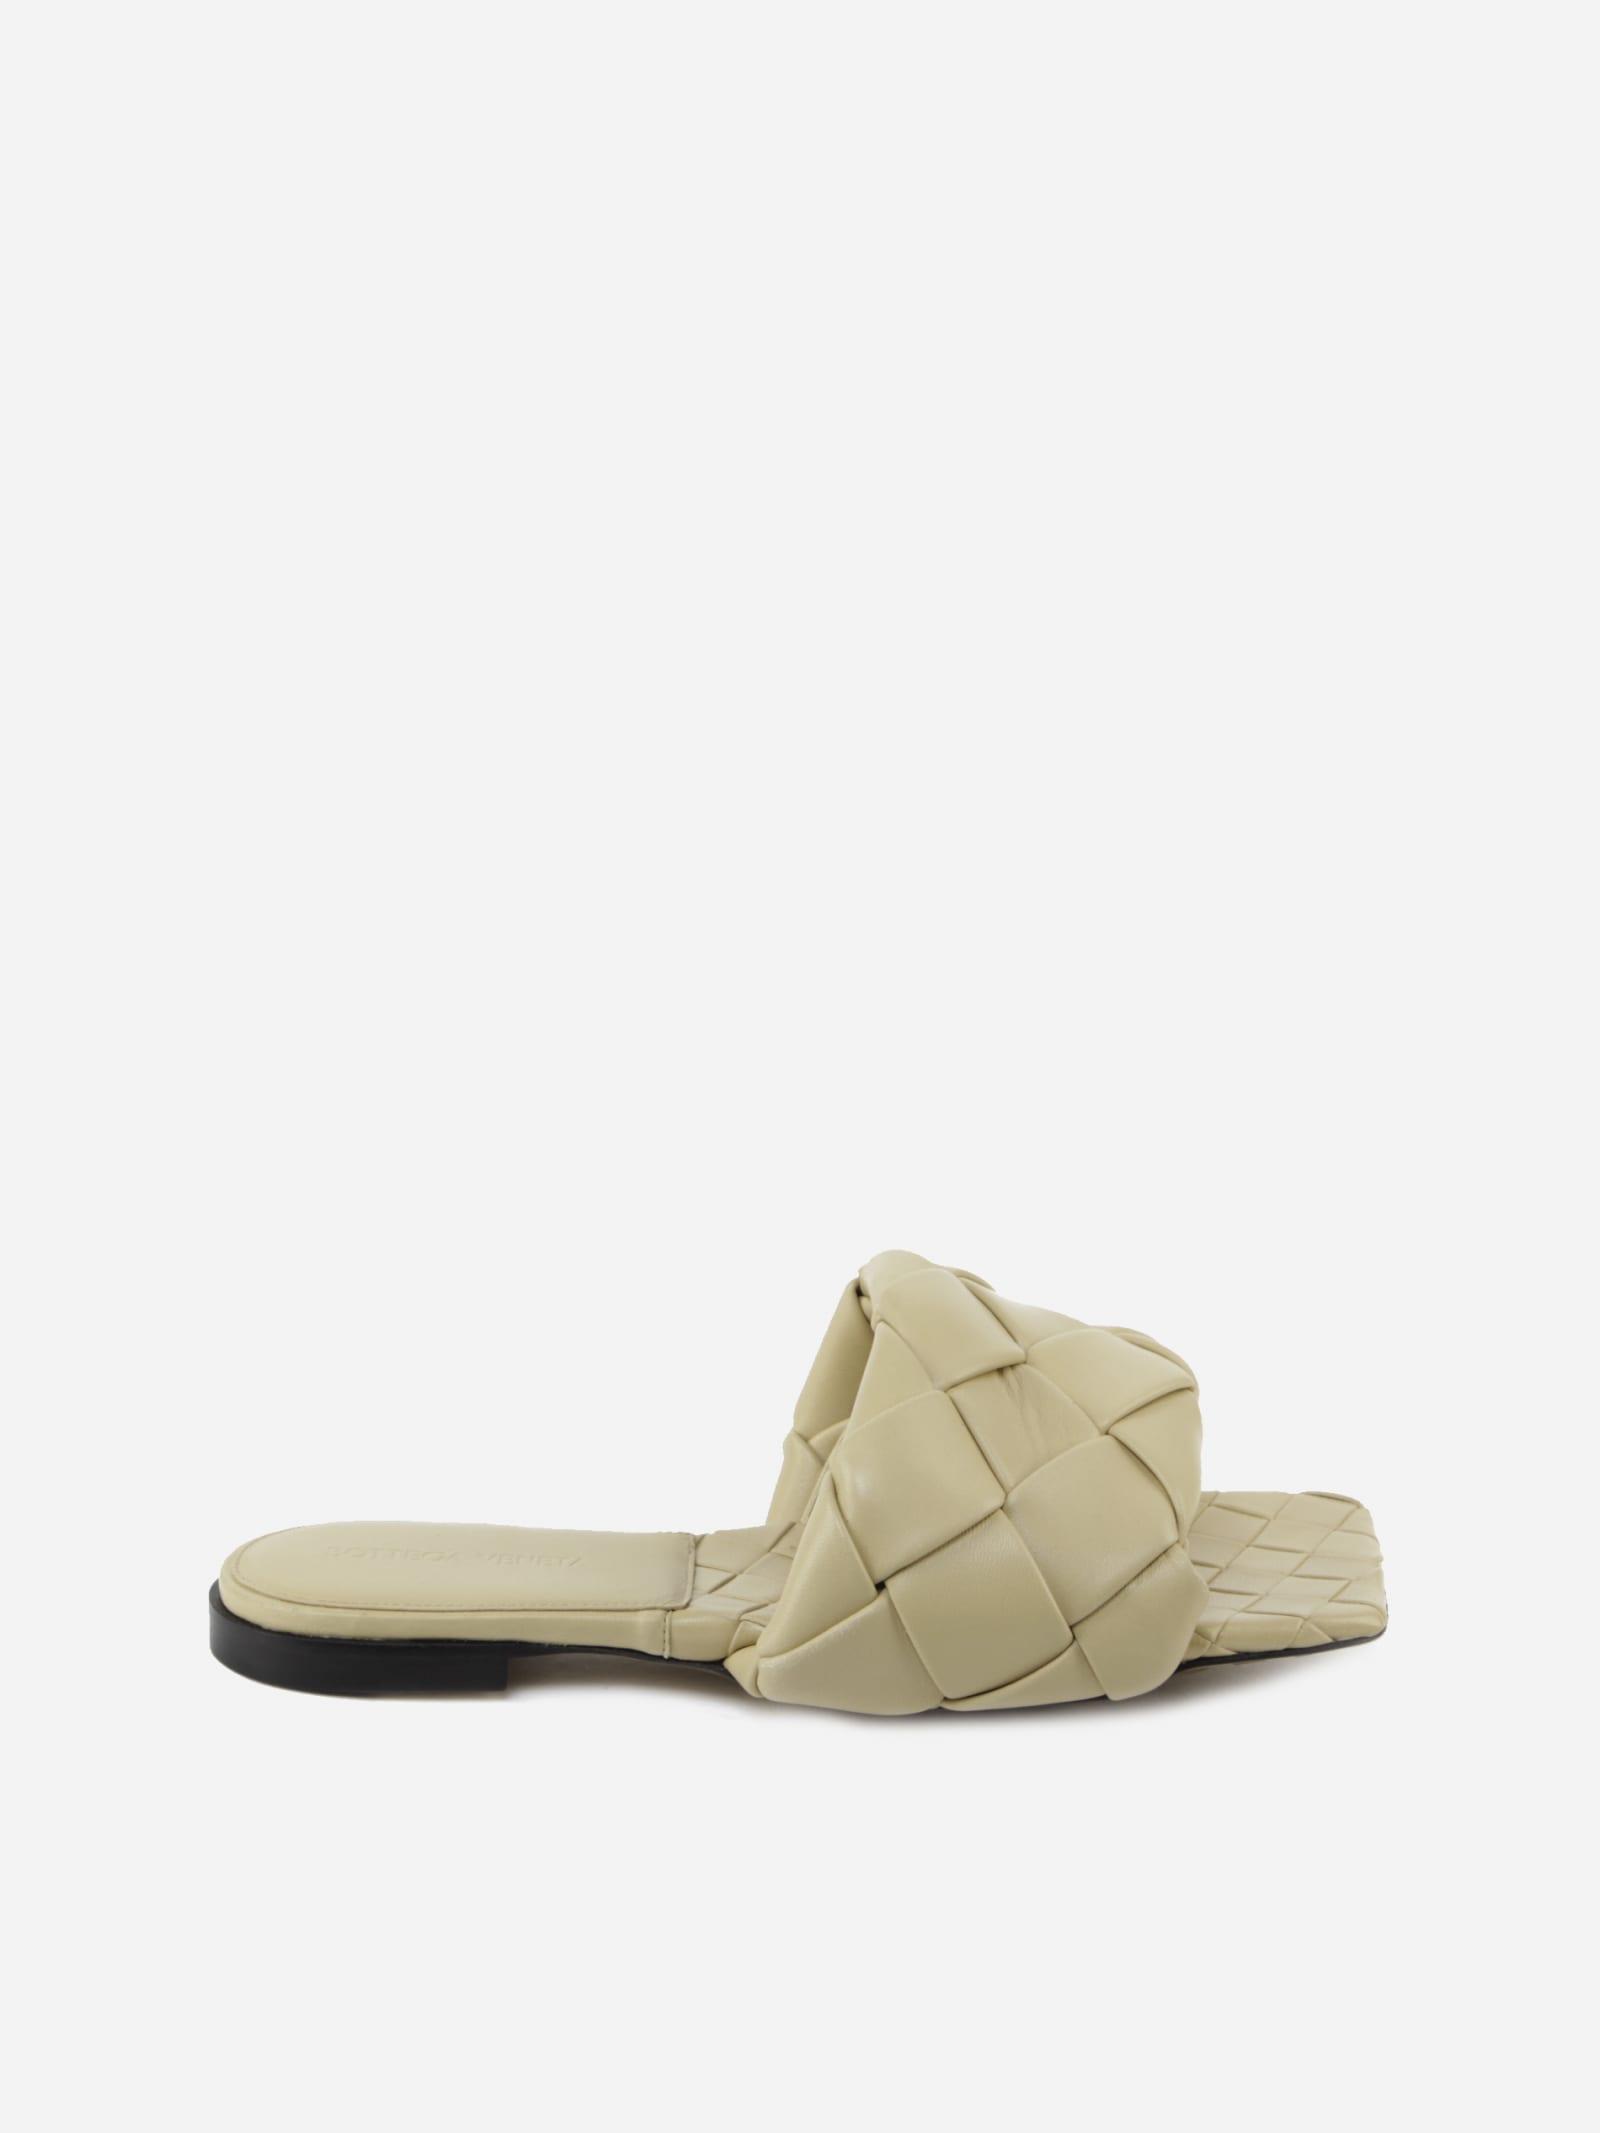 Buy Bottega Veneta Flat Lido Sandals In Intrecciato Nappa online, shop Bottega Veneta shoes with free shipping